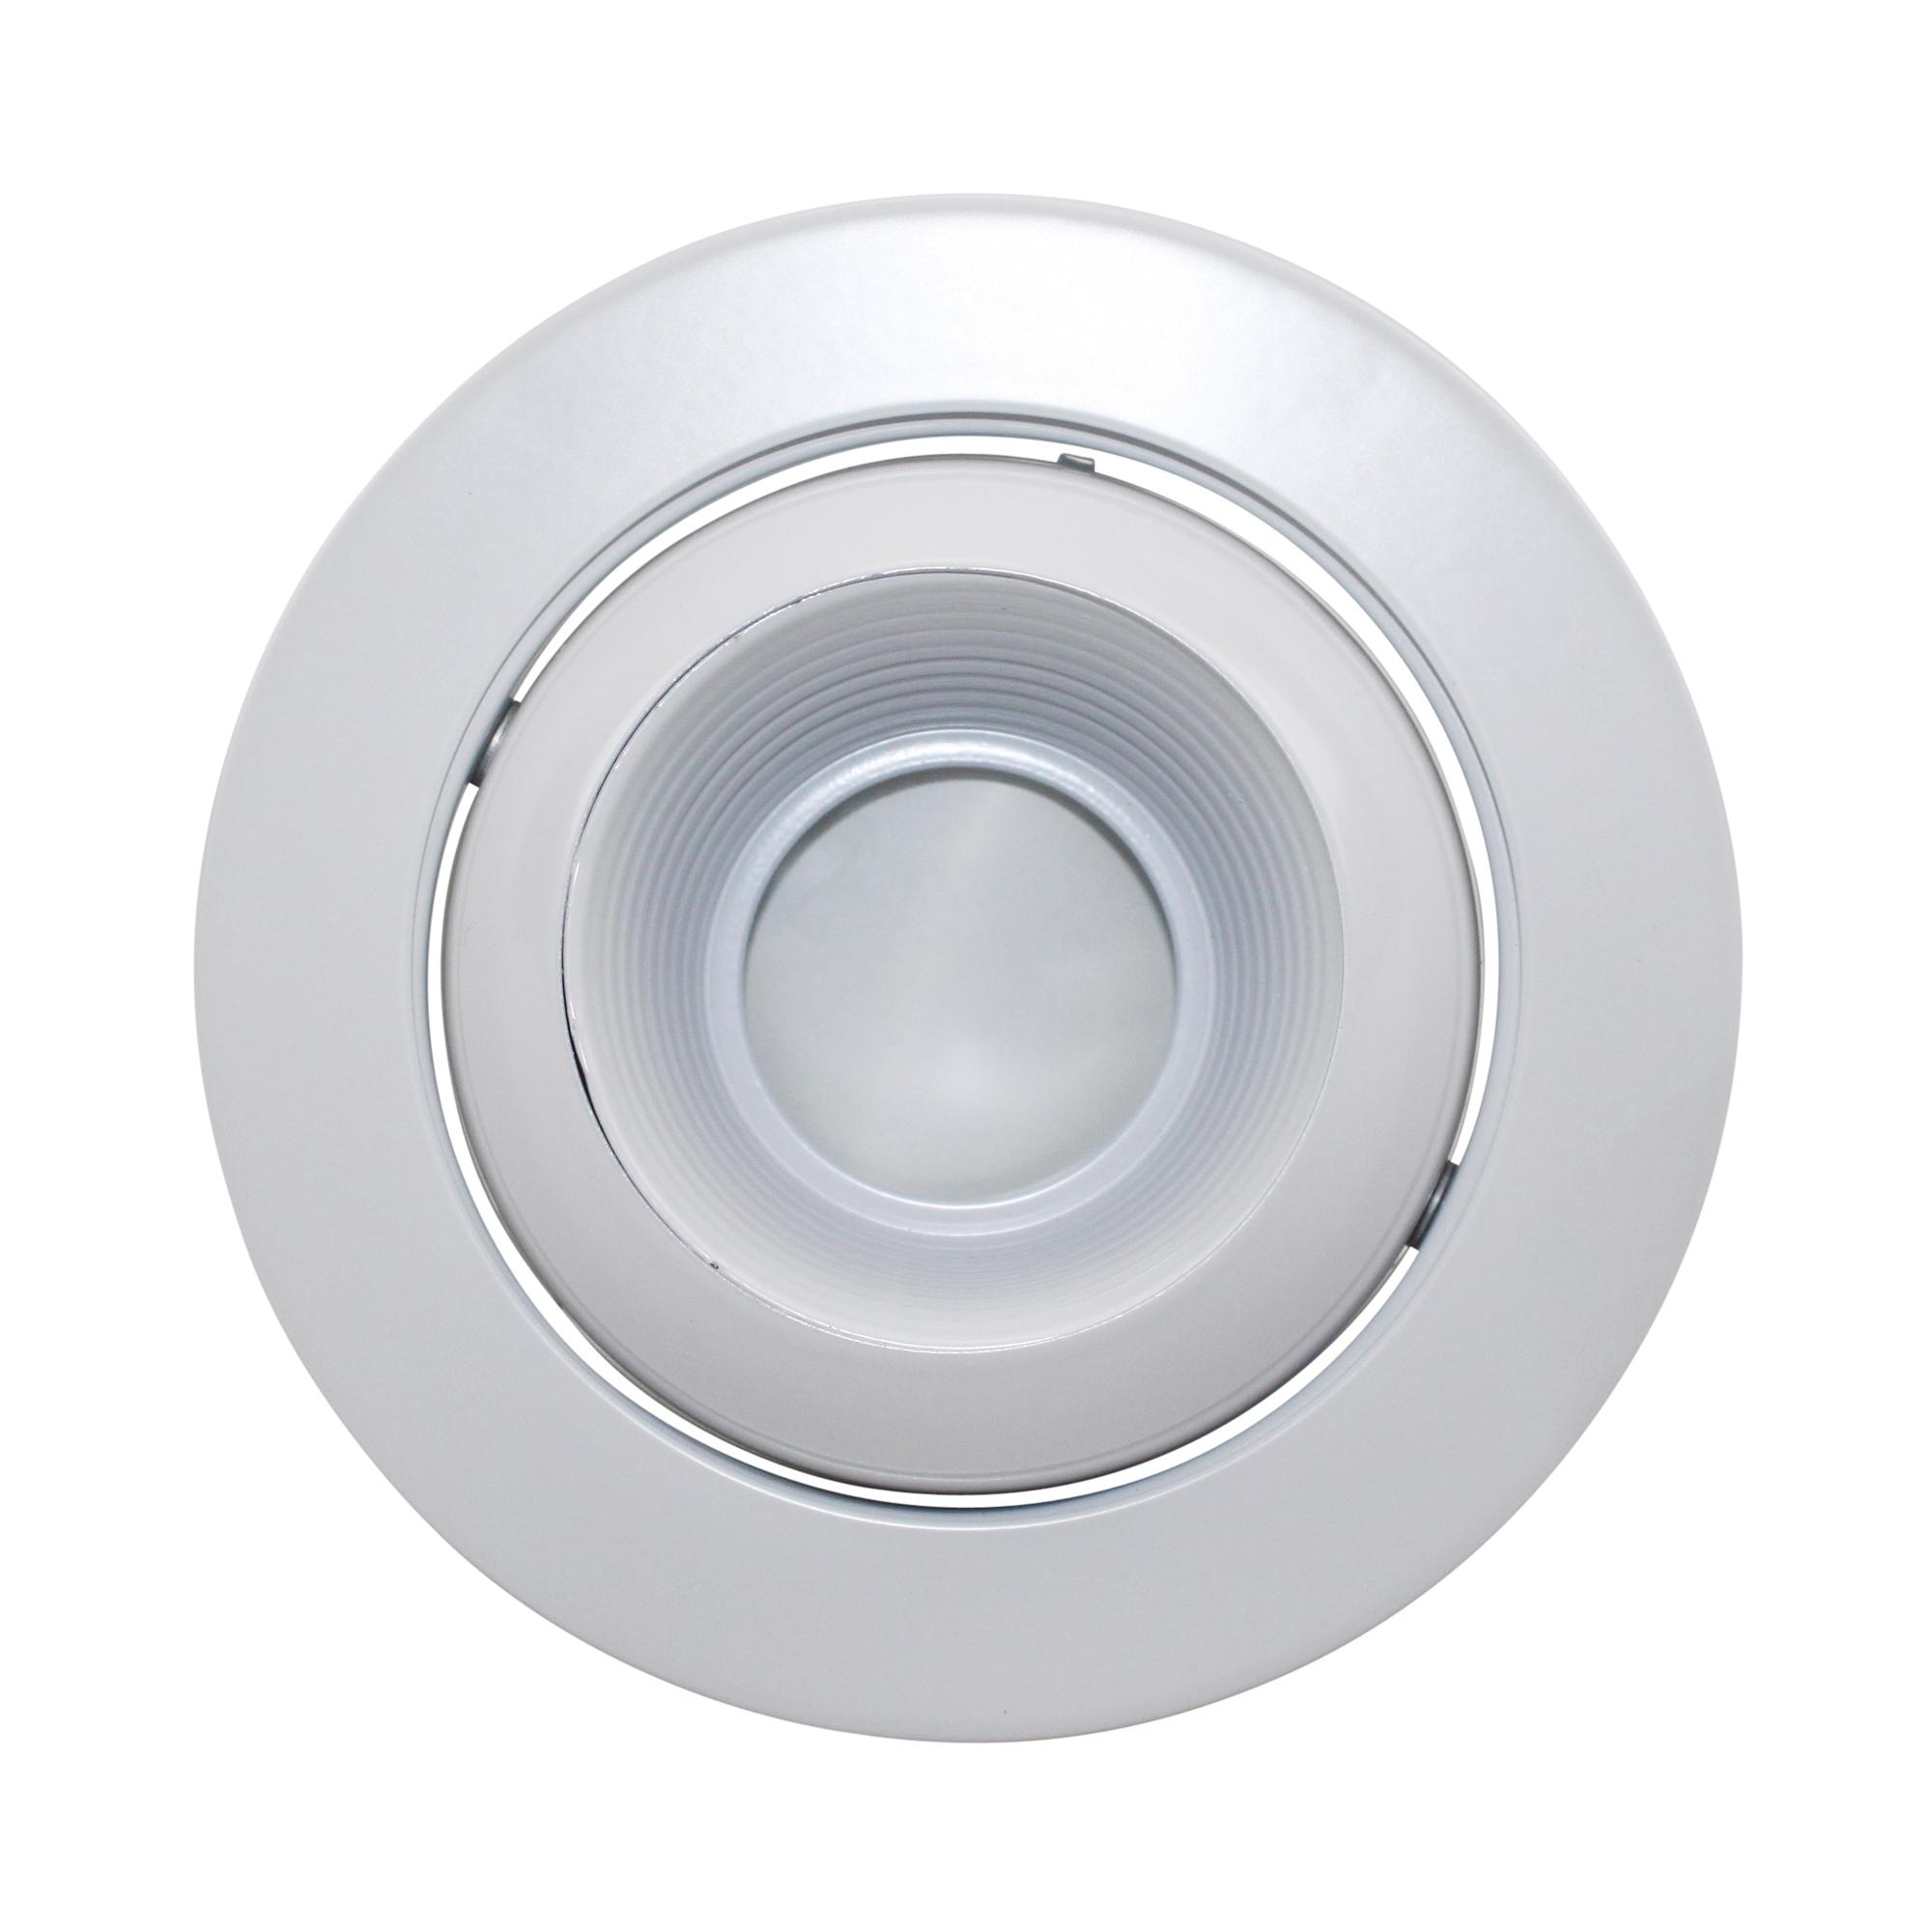 Capri lighting p4lew 4 adjustable eyeball trim low for Number of recessed lights per room